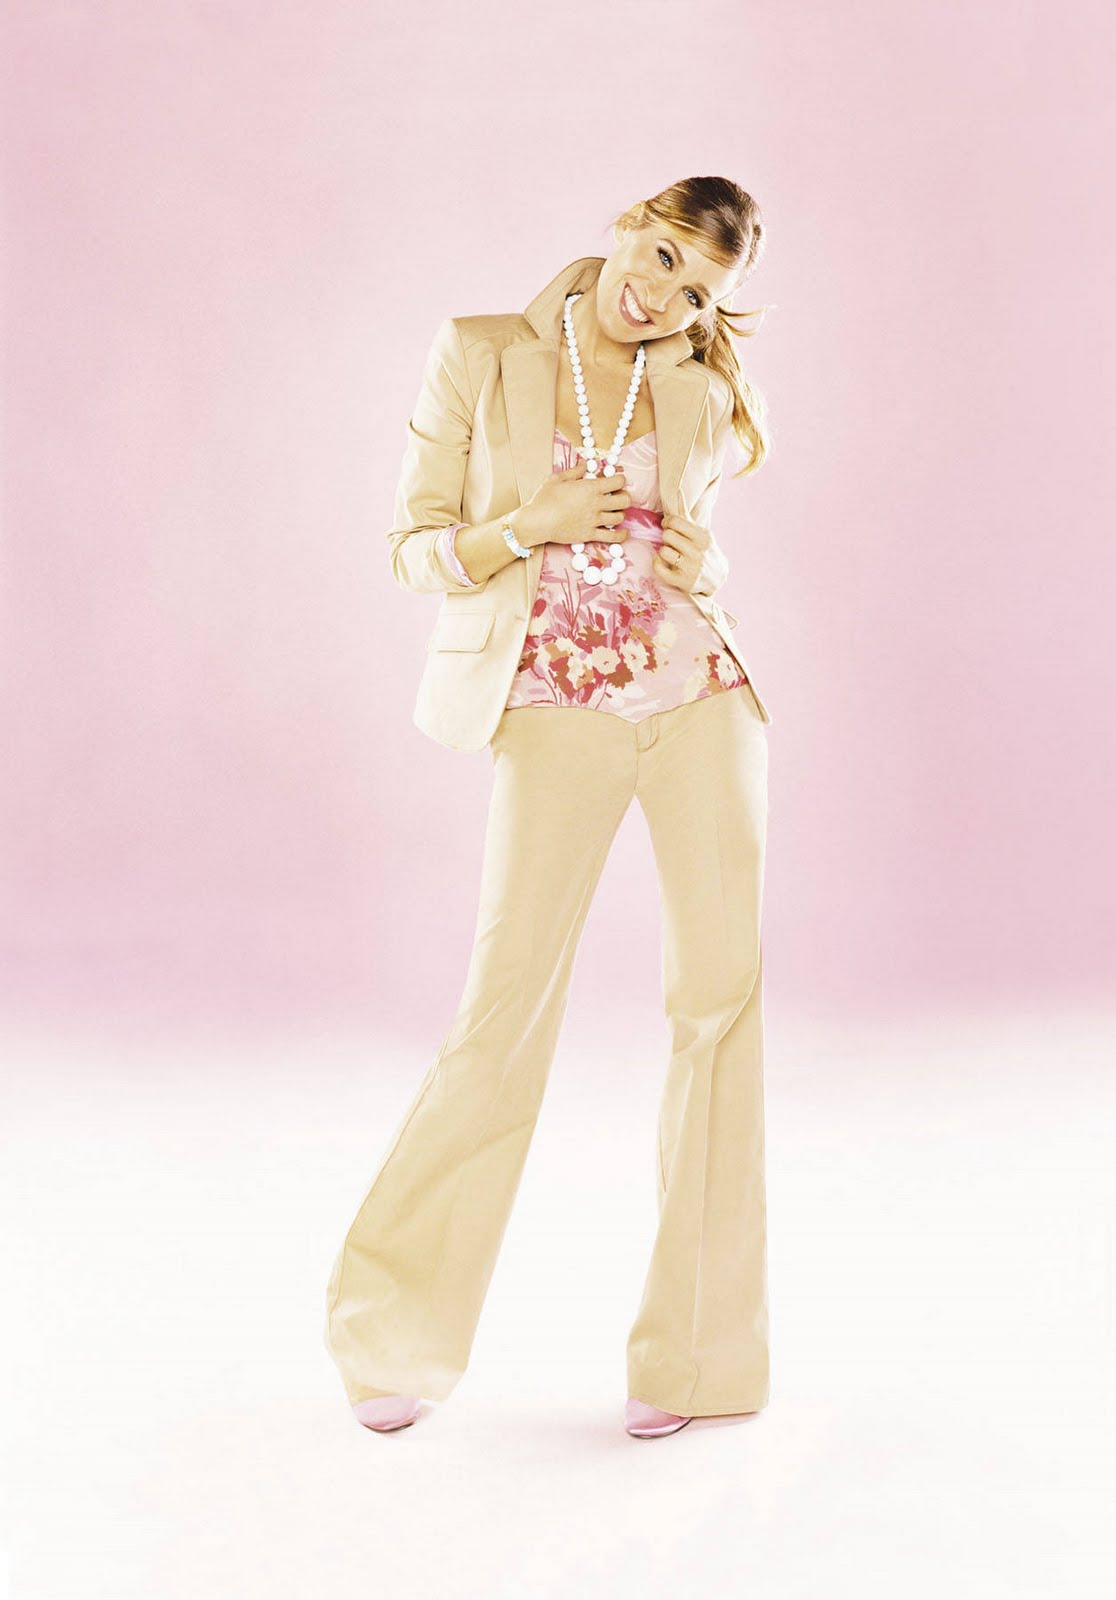 http://3.bp.blogspot.com/_BpAoKRSdVjQ/TJjojZNPsoI/AAAAAAAABmY/XICRrnBoDeM/s1600/SARAH-JESSICA-PARKER-celebrity.jpg